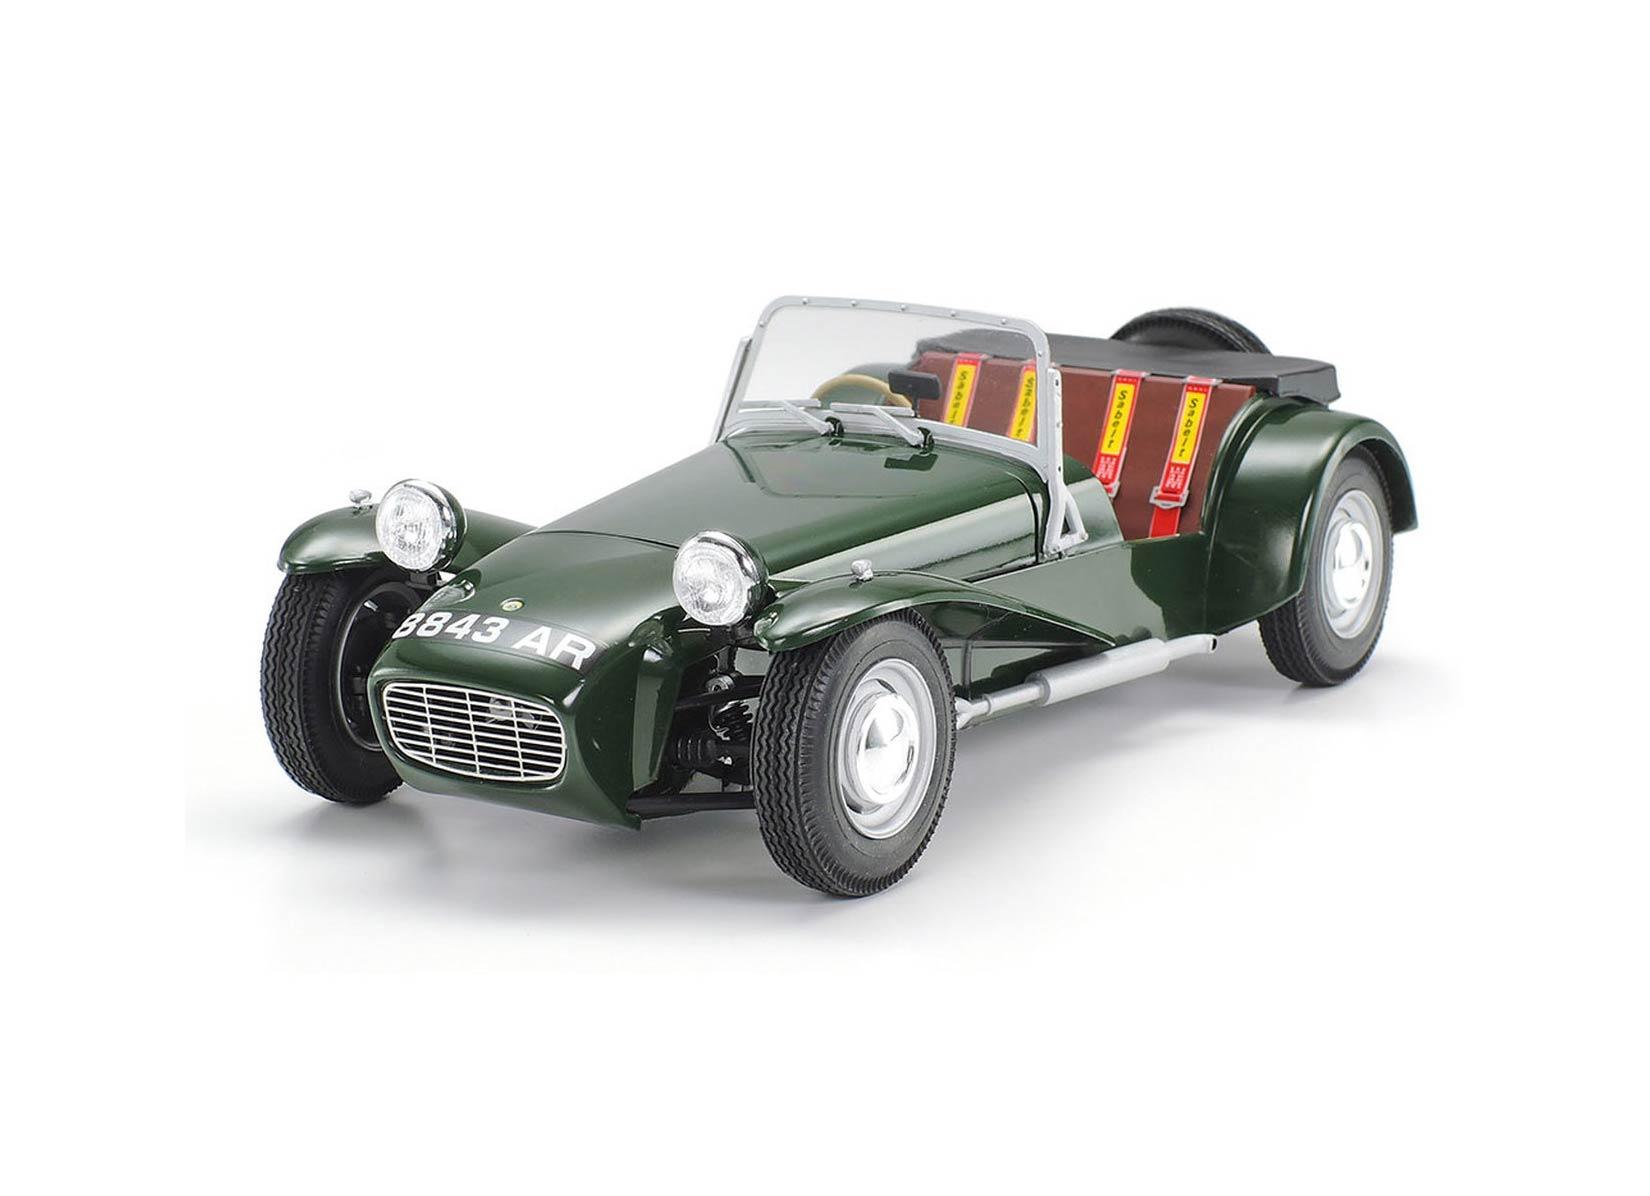 Tamiya Lotus Super 7 Series II